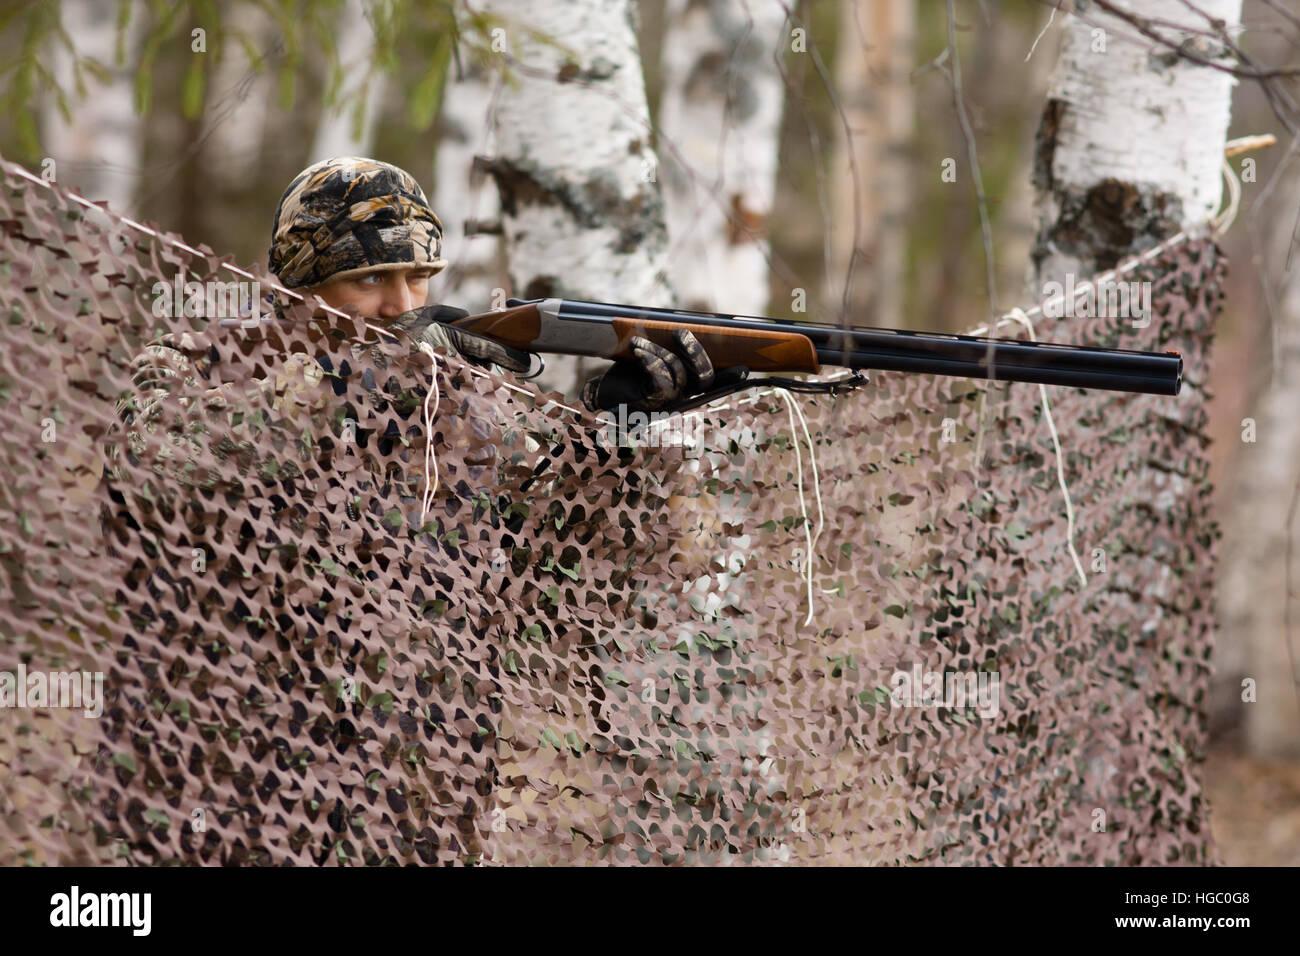 hunter aiming at the gamebird - Stock Image